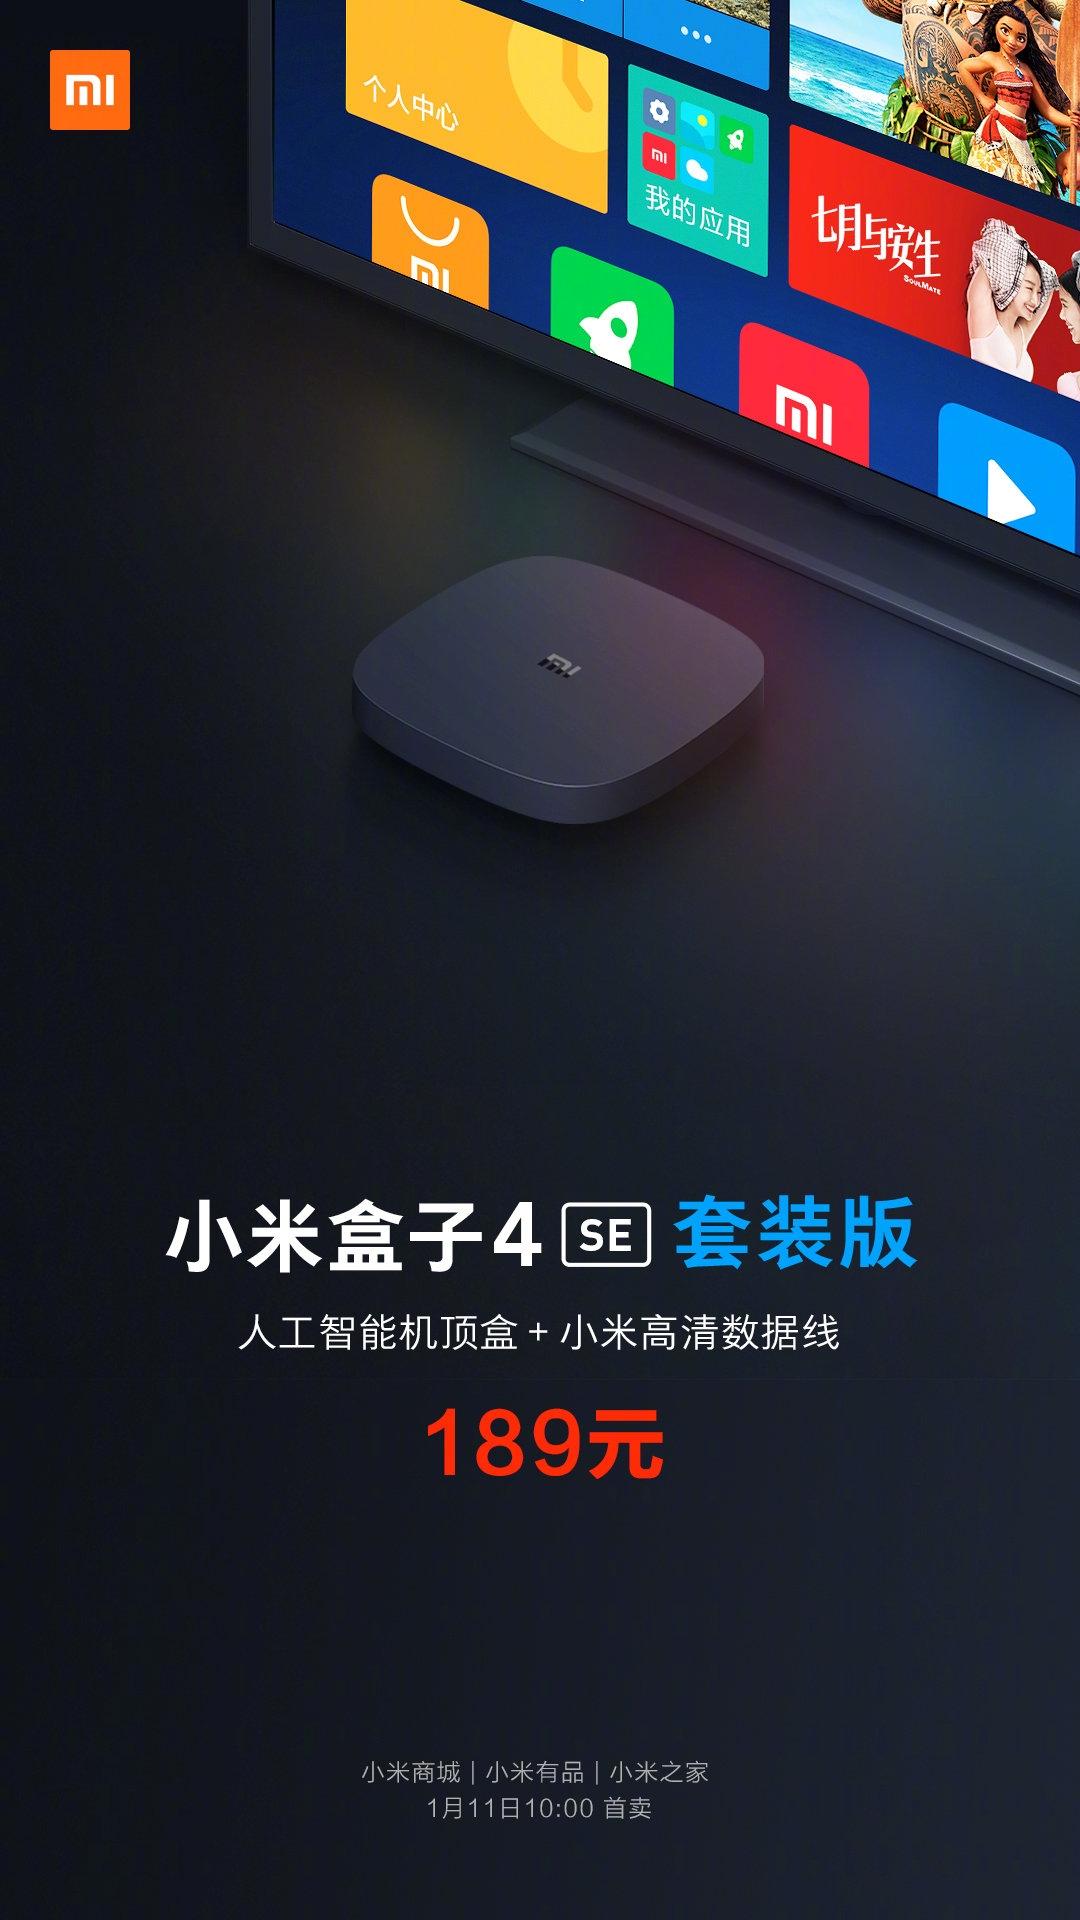 Xiaomi Mi TV Box 4 SE